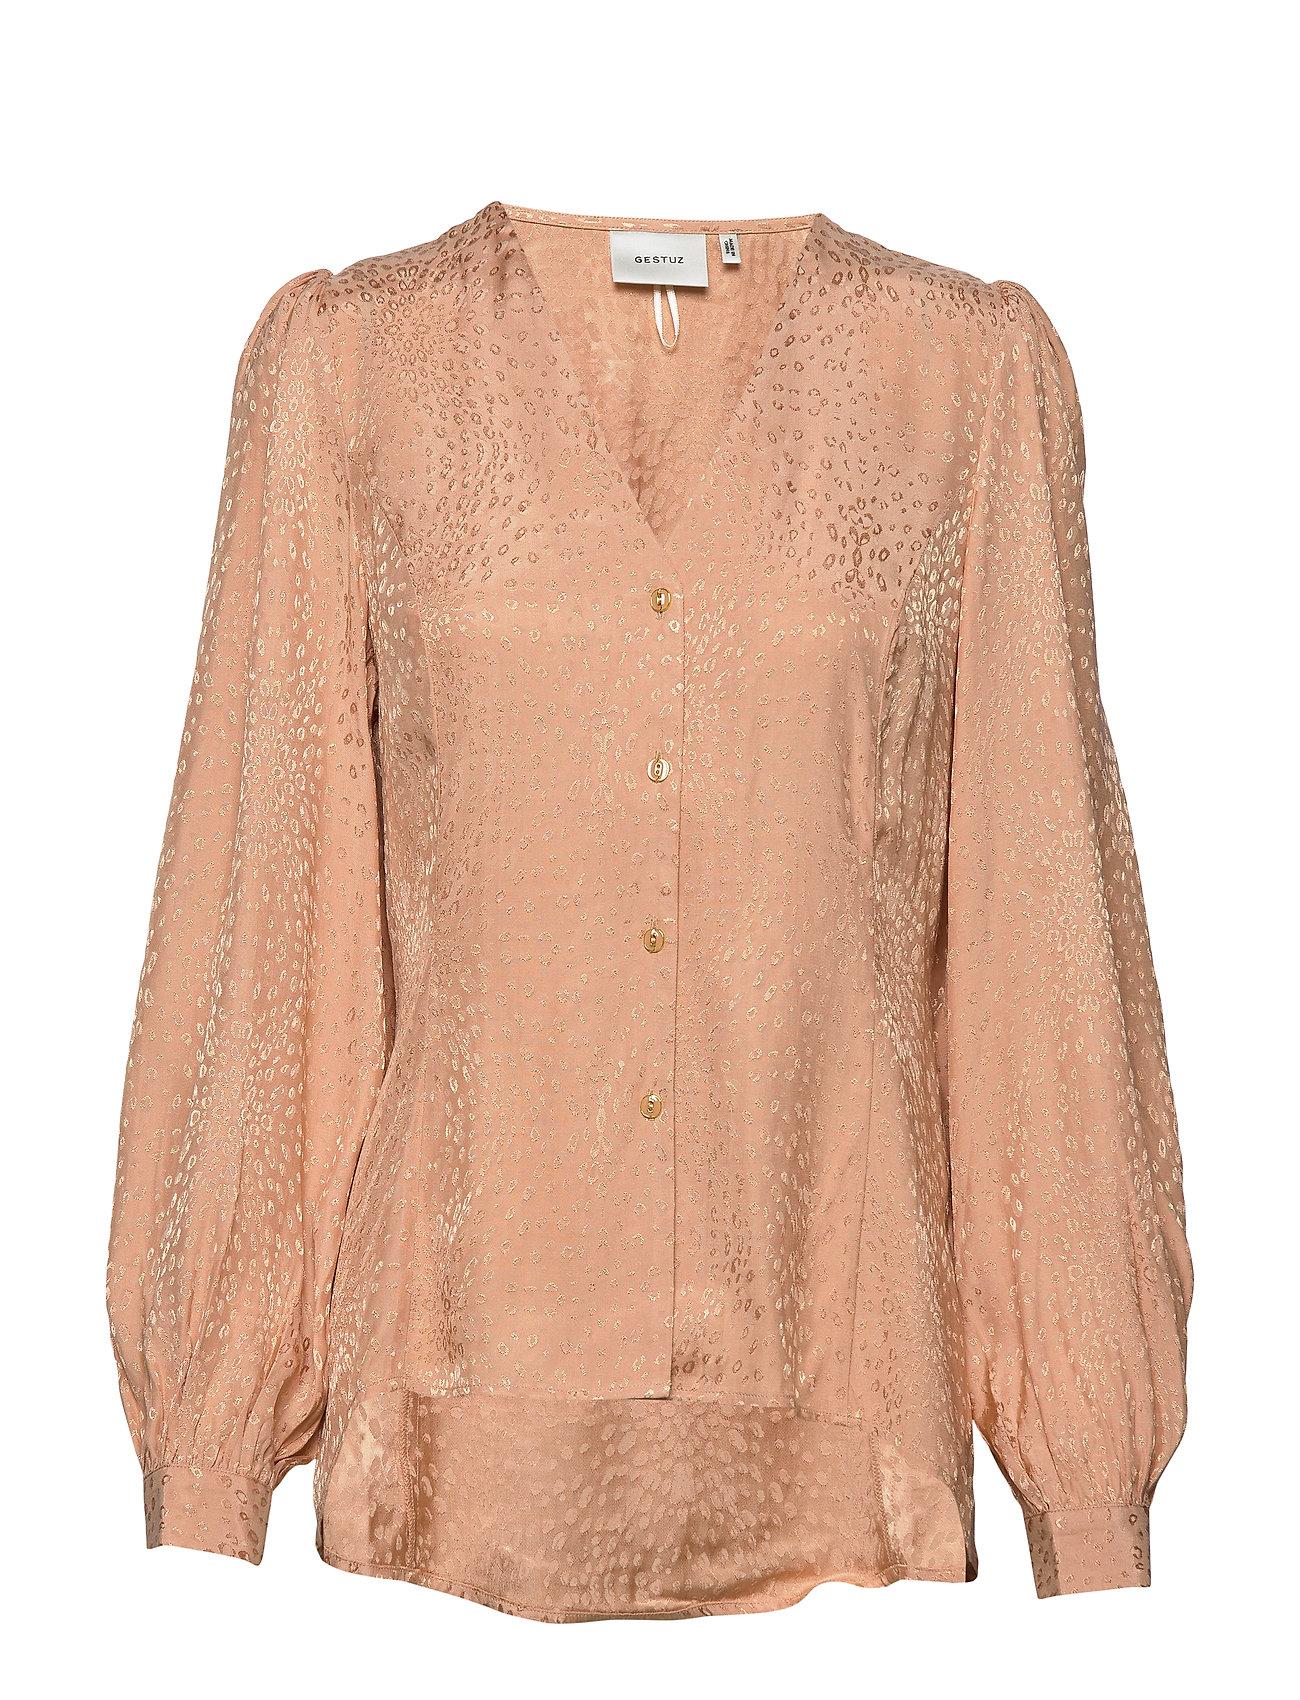 Gestuz MyaGZ blouse BZ - TUSCANY